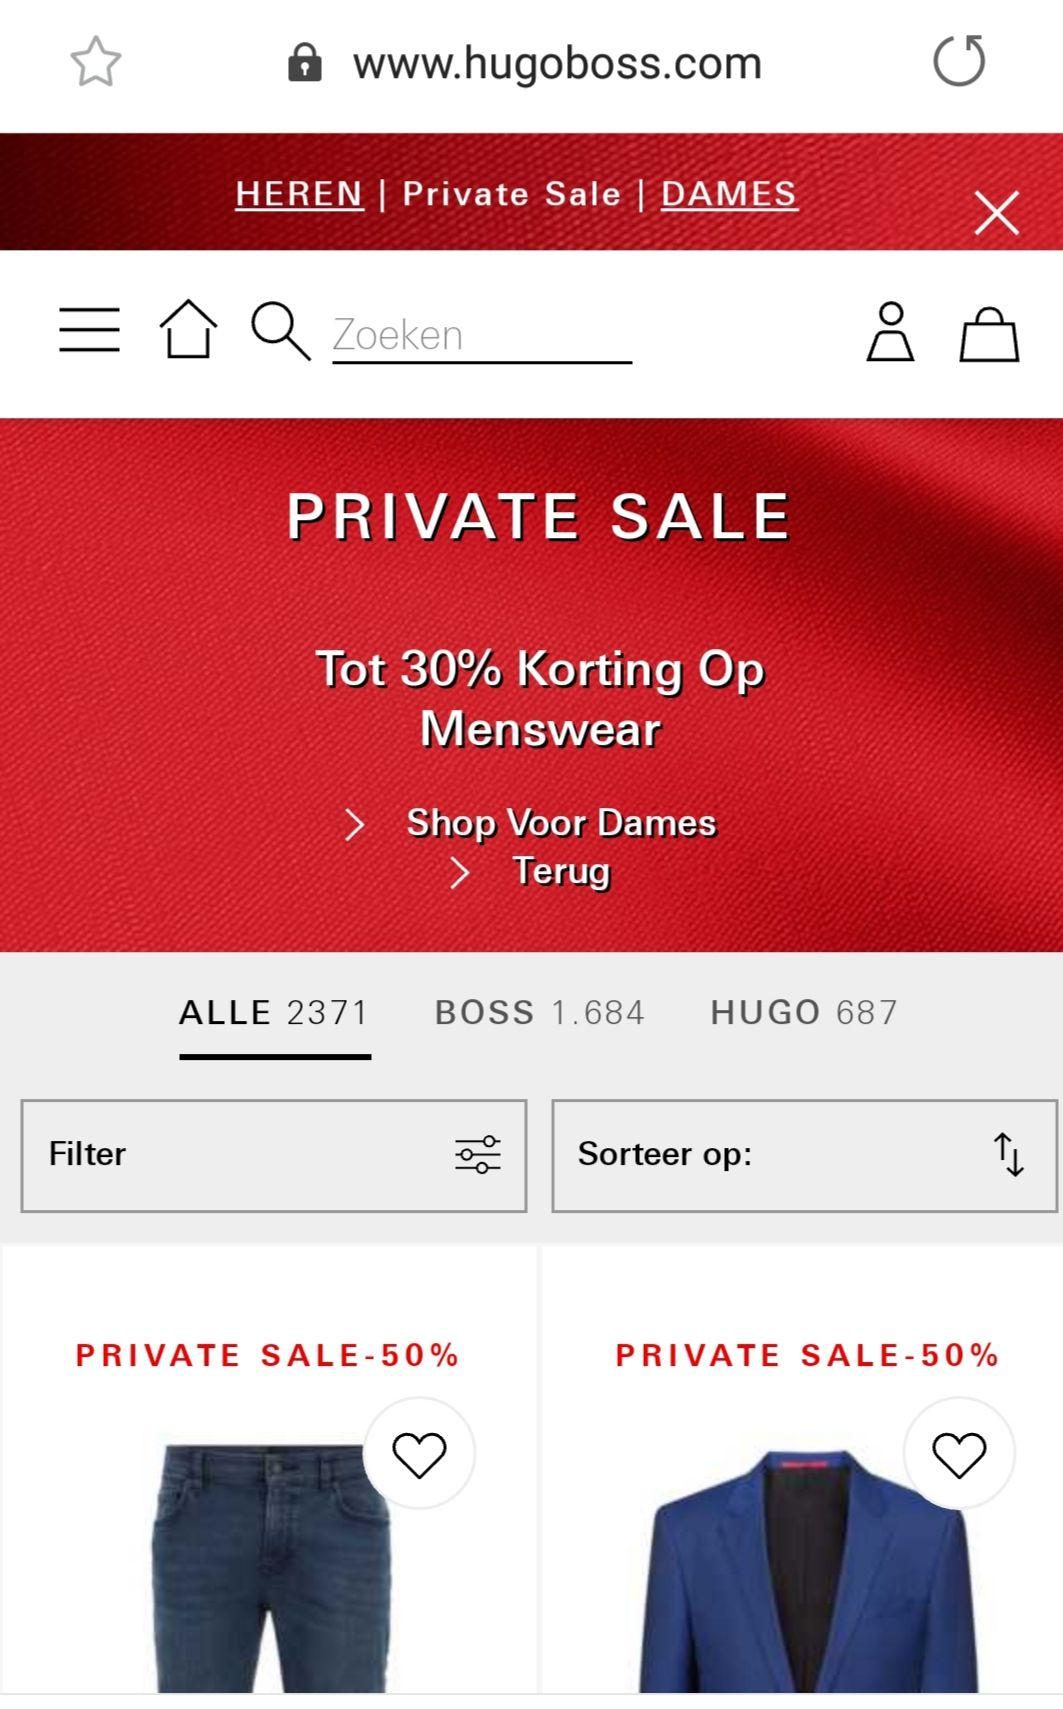 Hugo Boss private sale